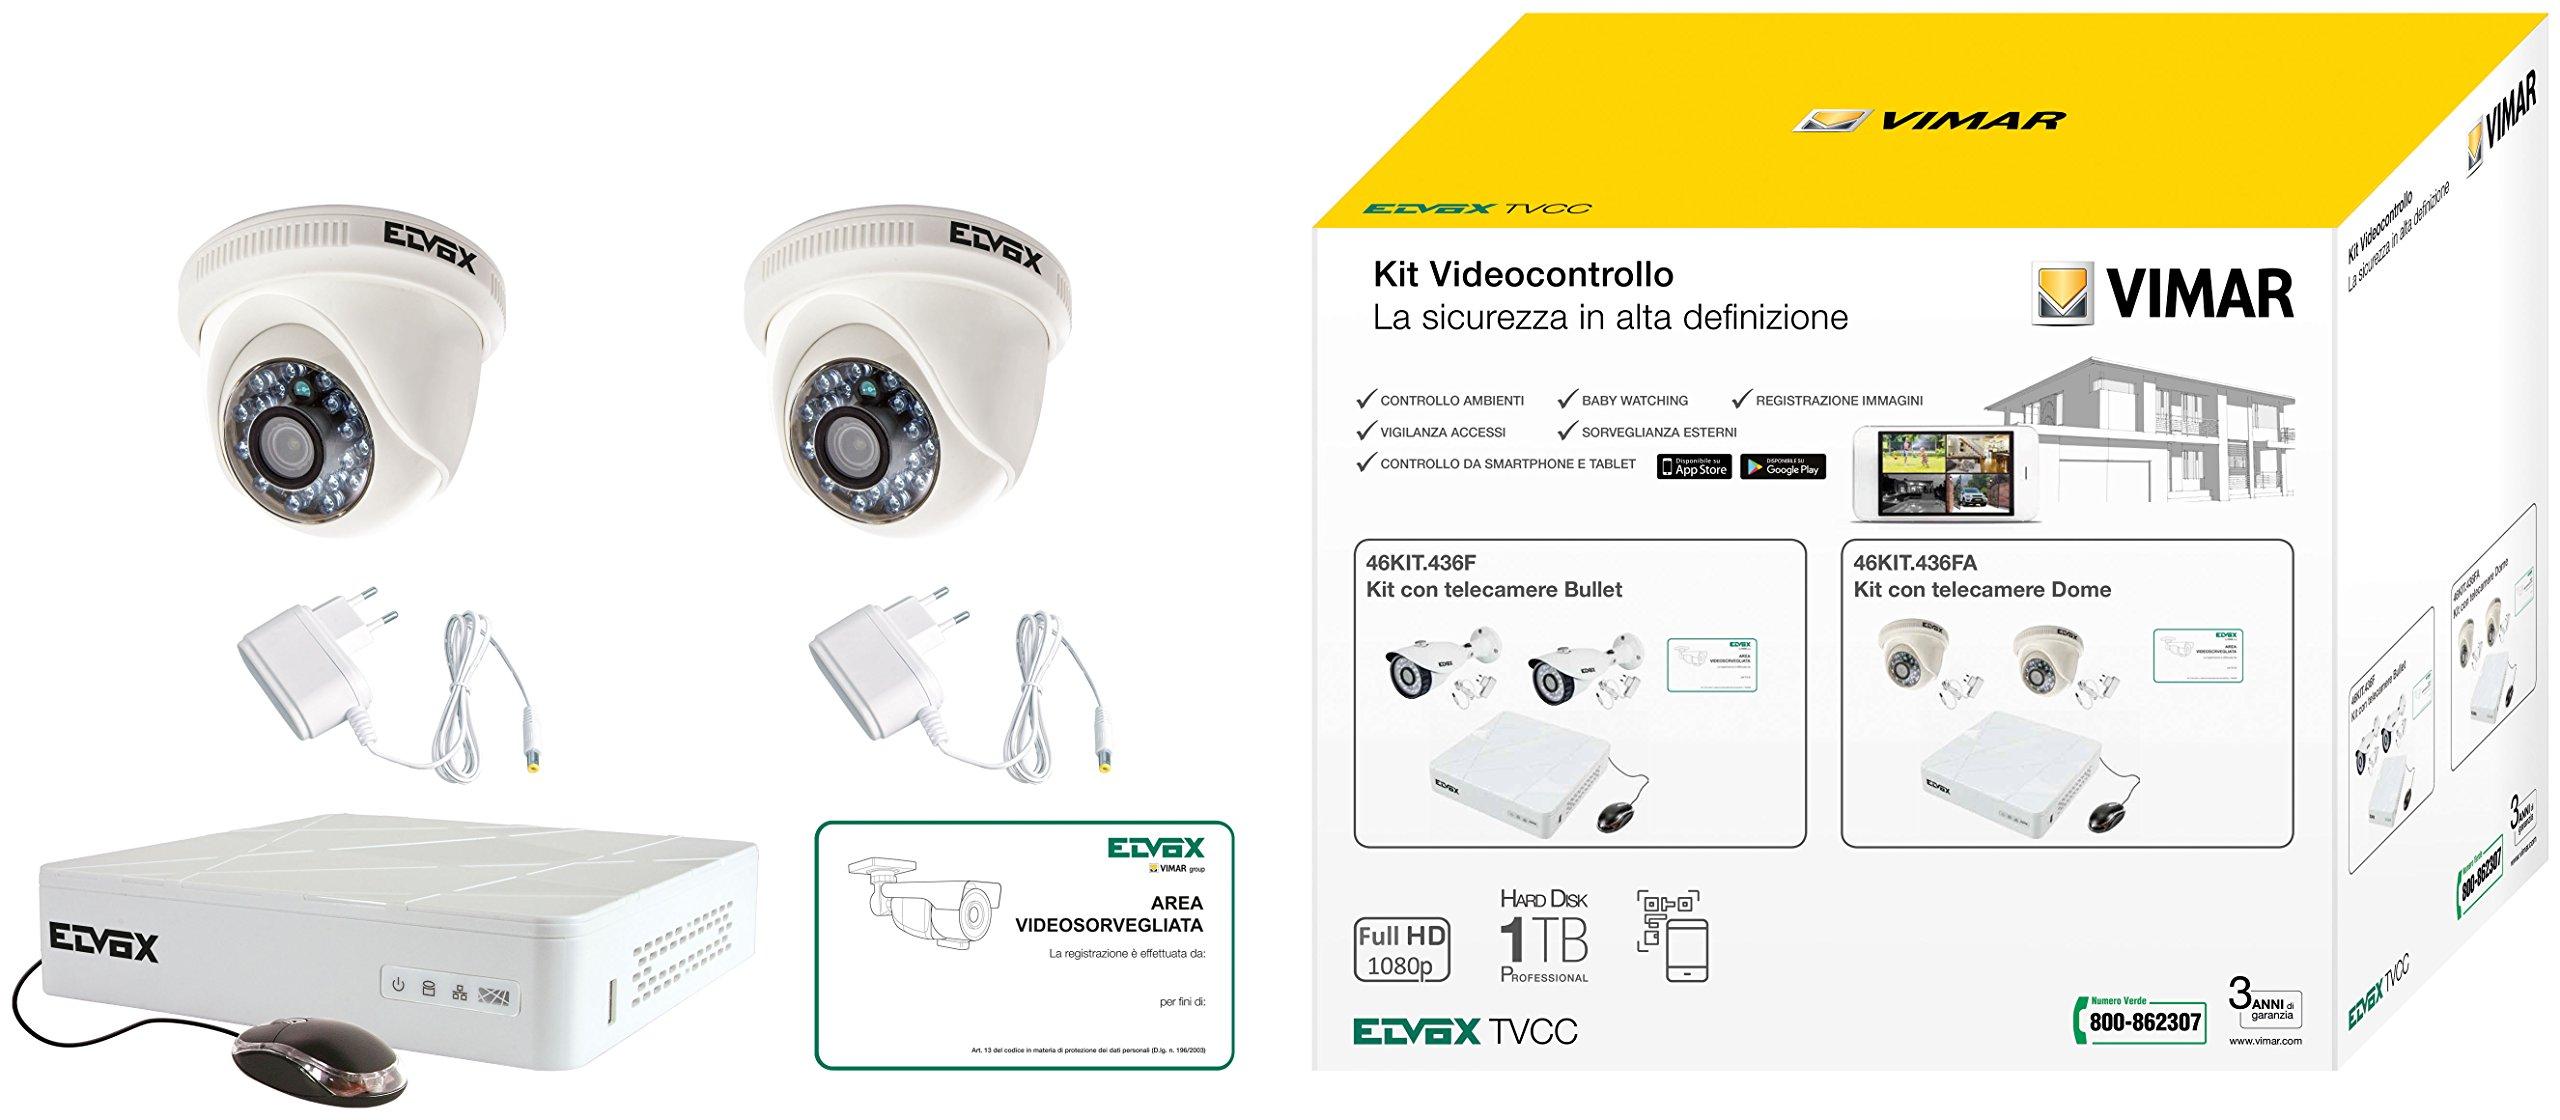 Vimar 46KIT.436FA AHD 1080p 4-Channel Dome FF CCTV Kit by VIMAR